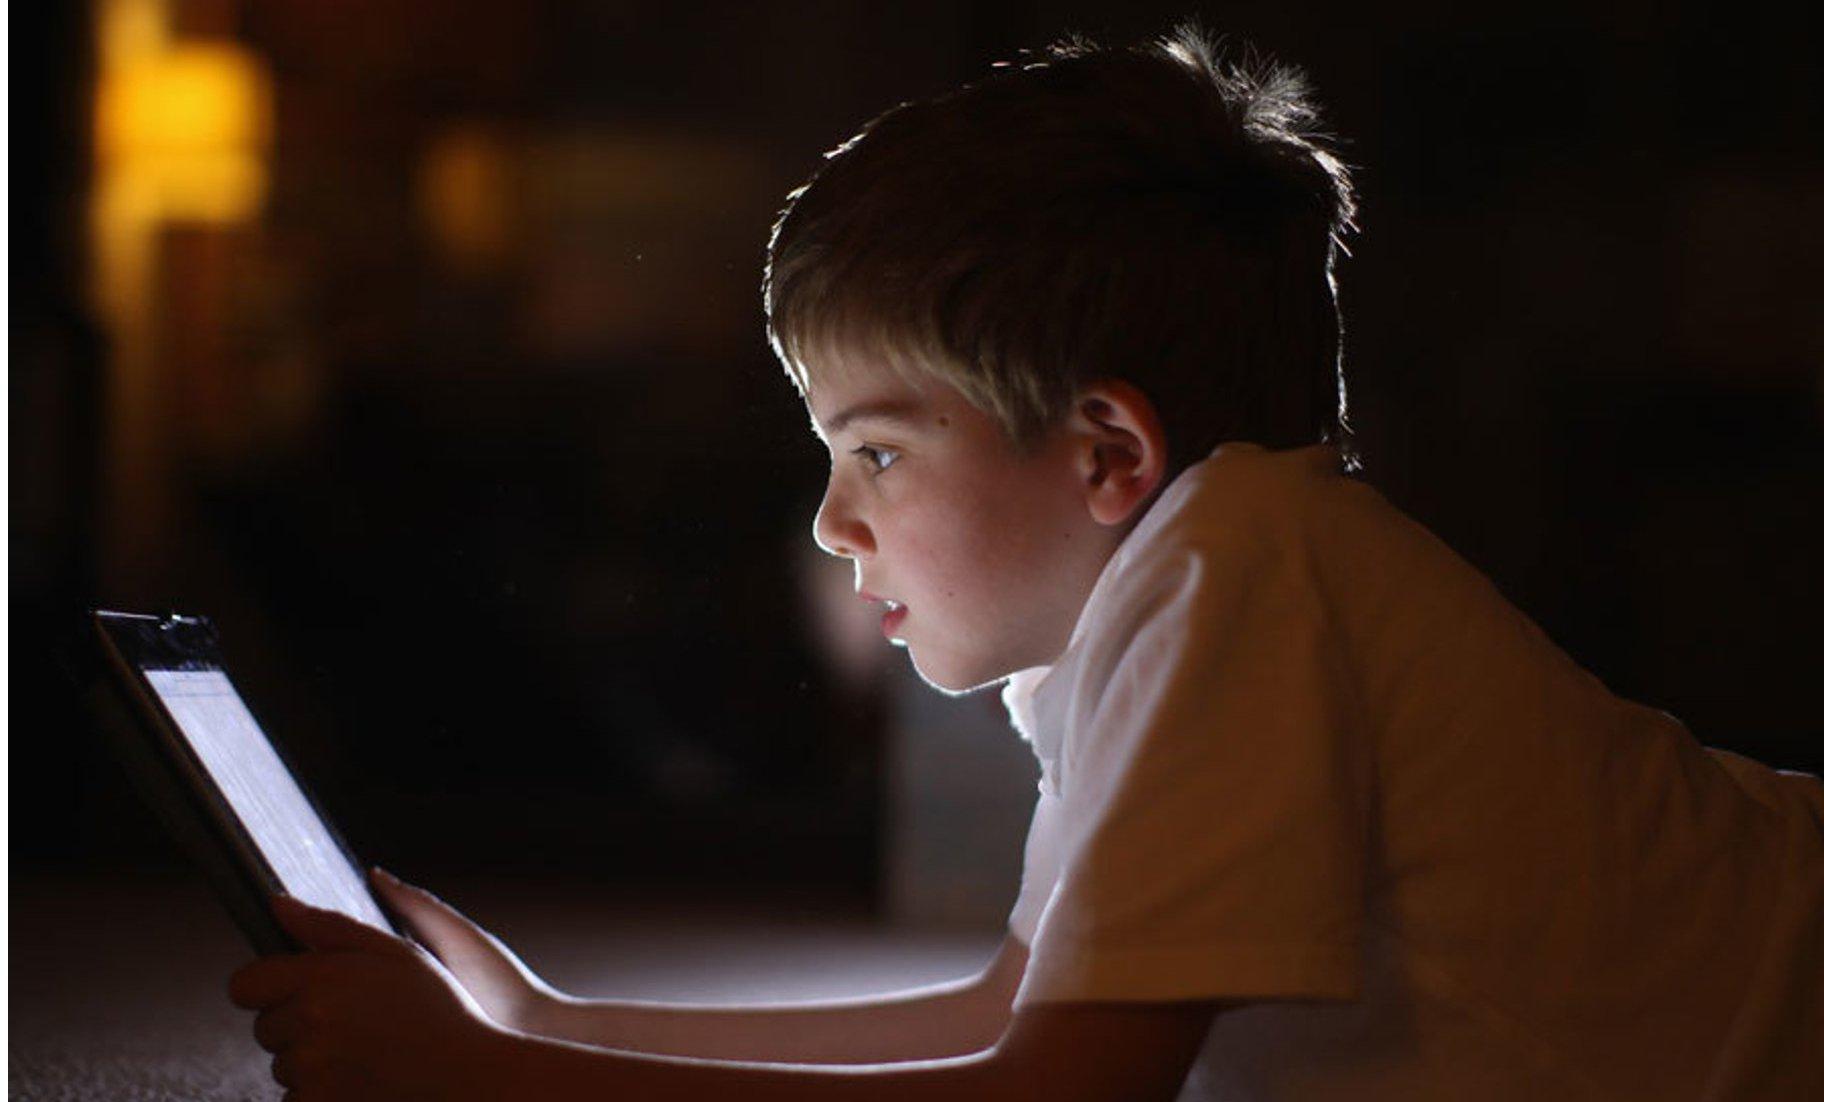 Safe Browsing-Kid in the dark